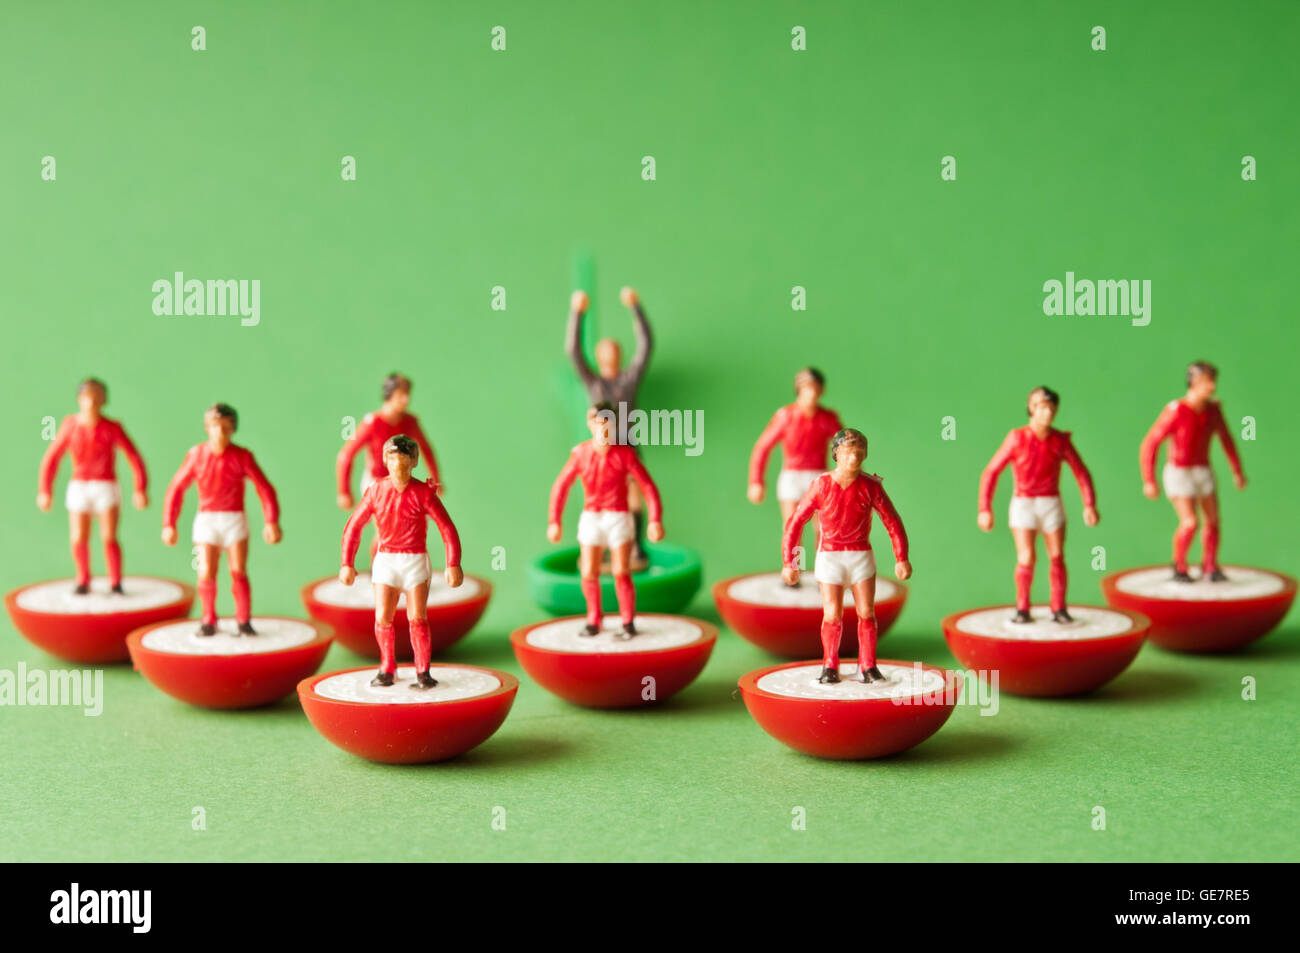 Equipo de fútbol Subbuteo de plástico con camiseta roja Imagen De Stock